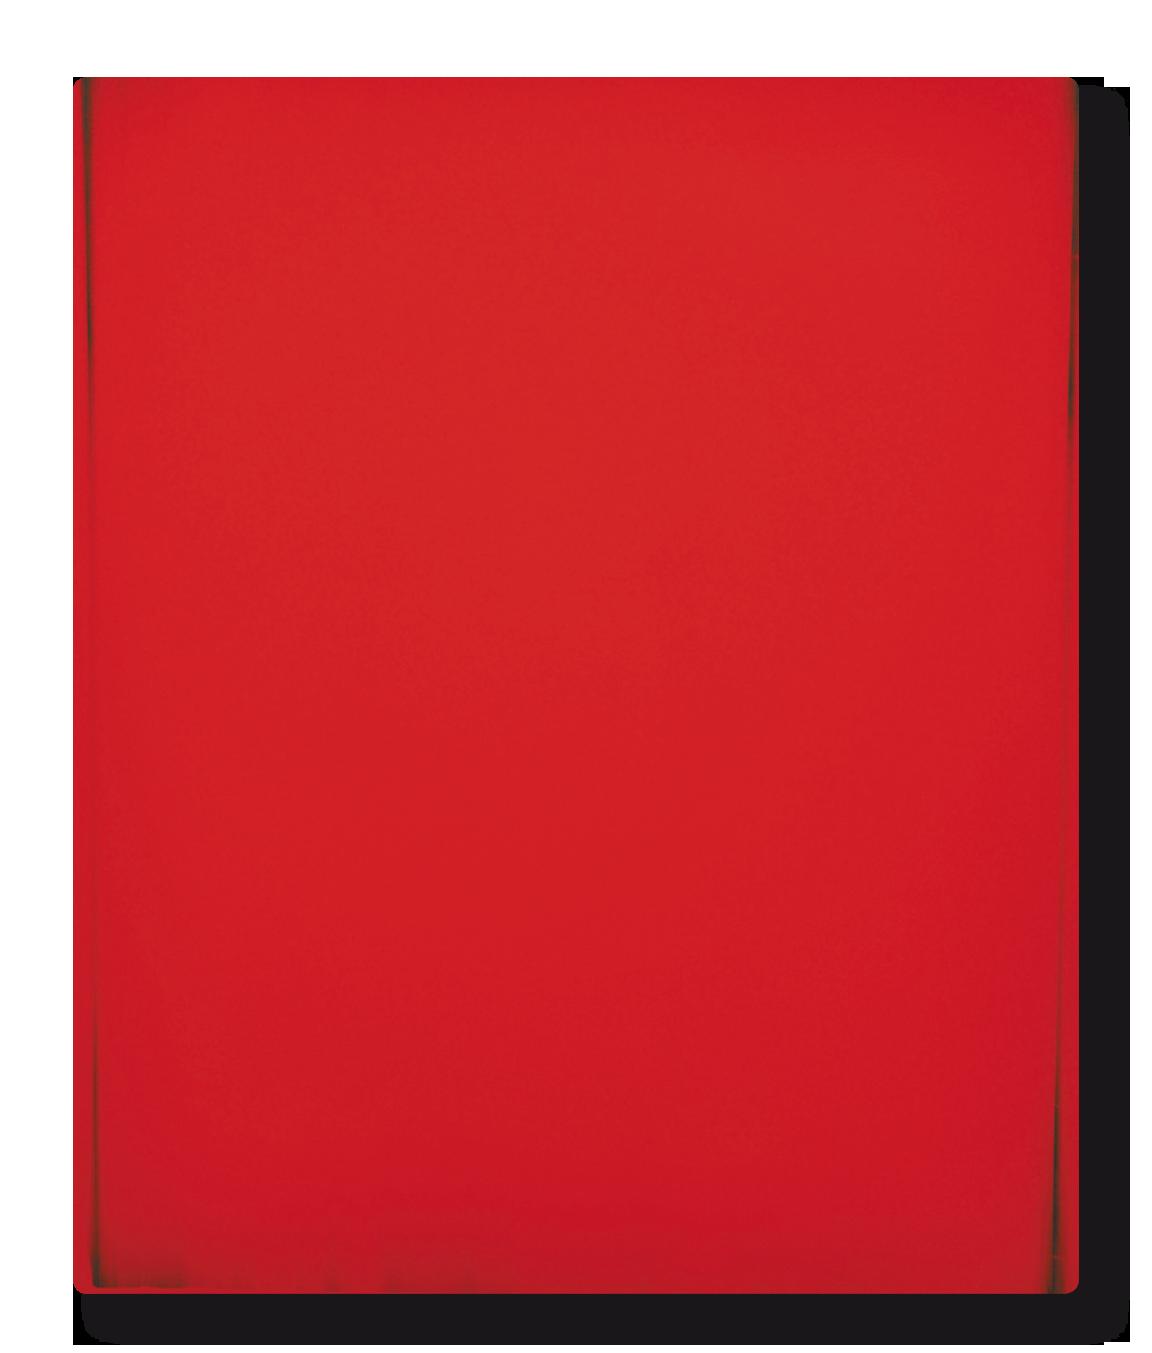 DOORA_AF 2006-45.png